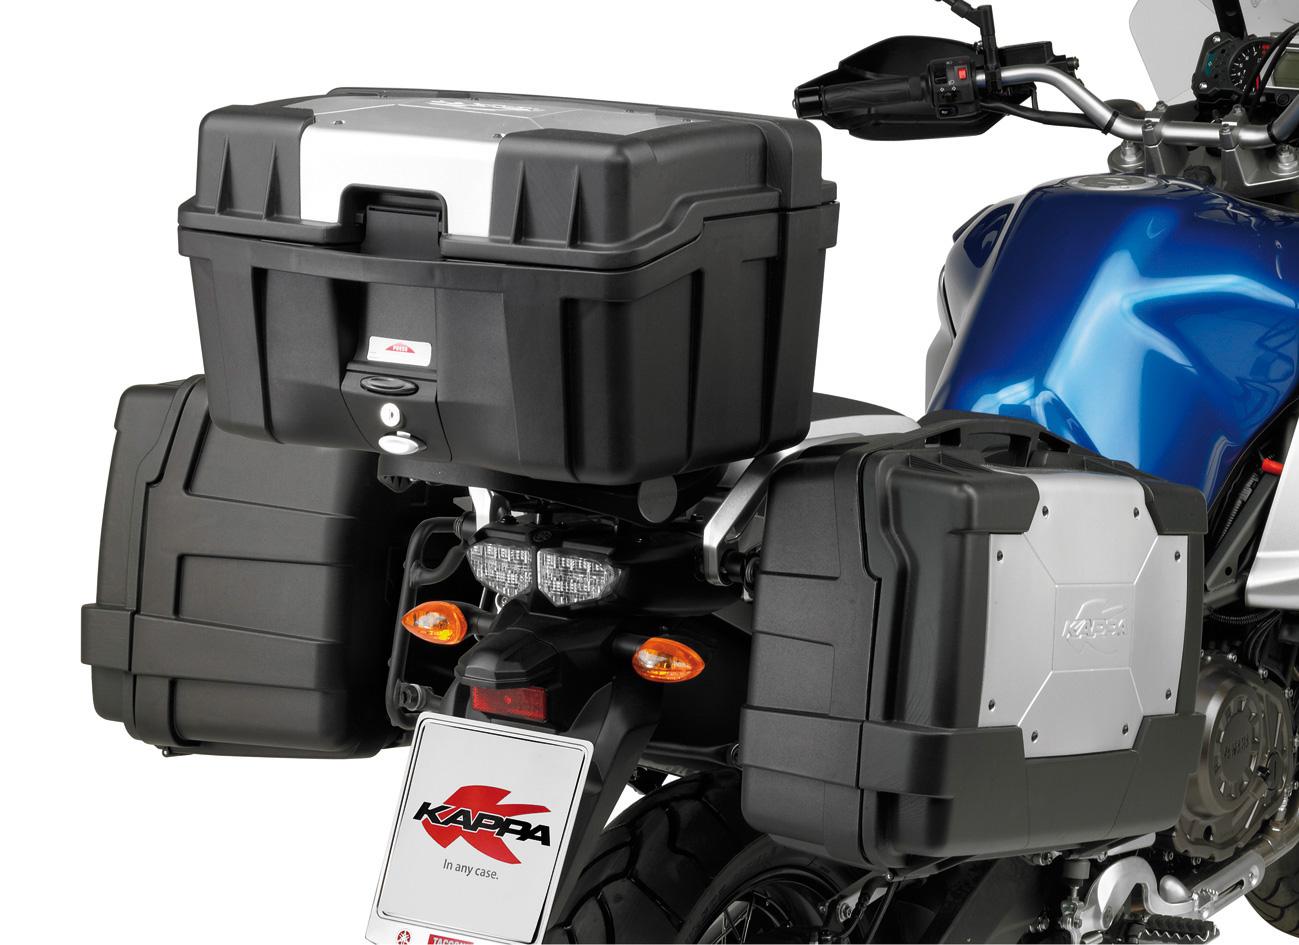 【KAPPA】46lt. MONOKEY 後行李箱-(無燈) - 「Webike-摩托百貨」